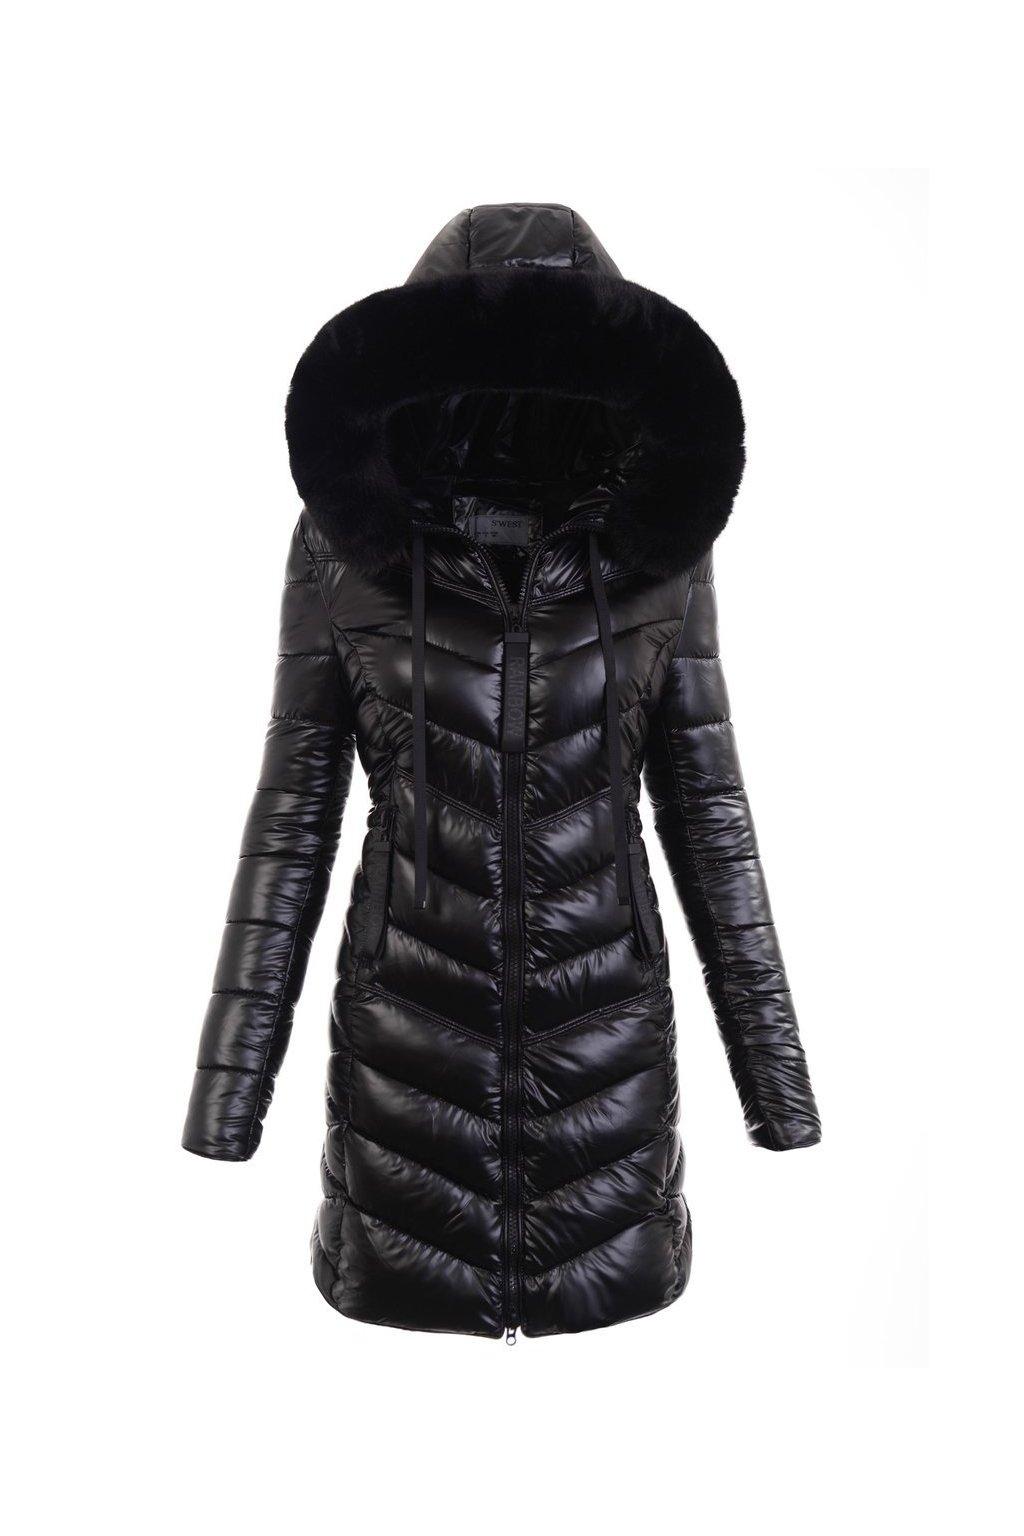 Dámska dlhá zimná bunda s kapucňou 6017 čierna